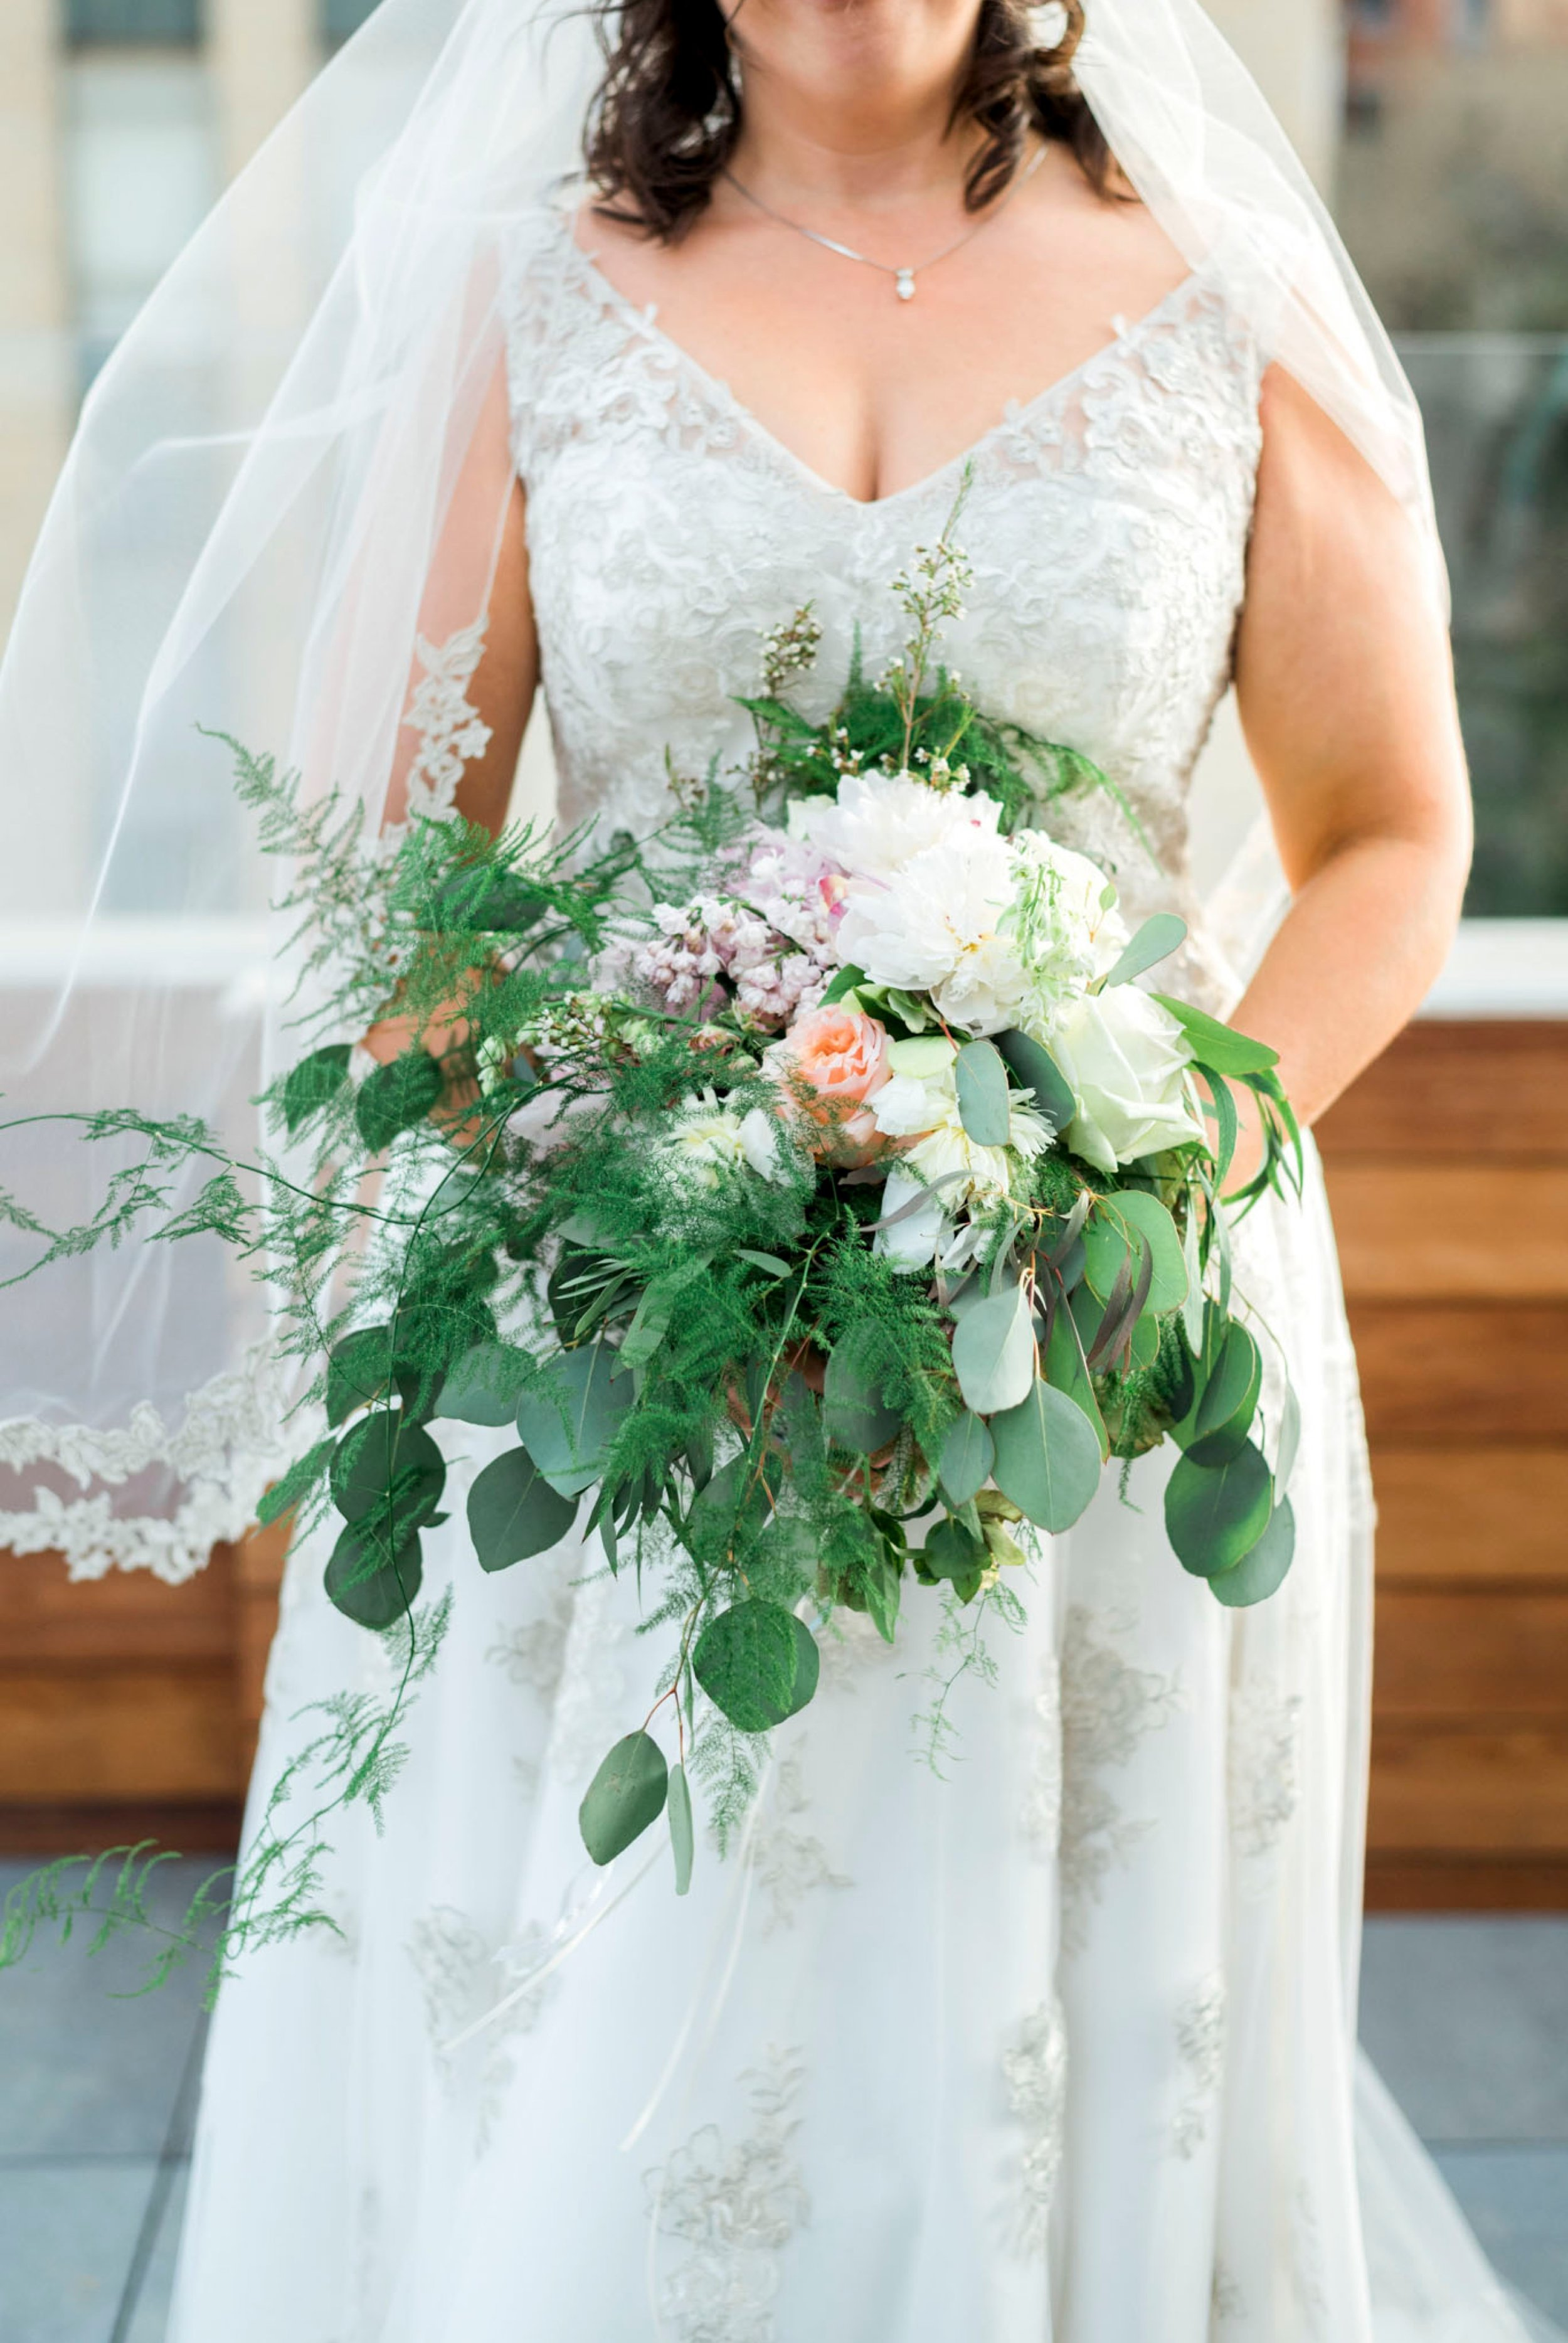 TheVirginianHotel_LynchburgVA_TheVirginianHotelWedding_Virginiaweddingphotographer_Lynchburgvawedding 10.jpg